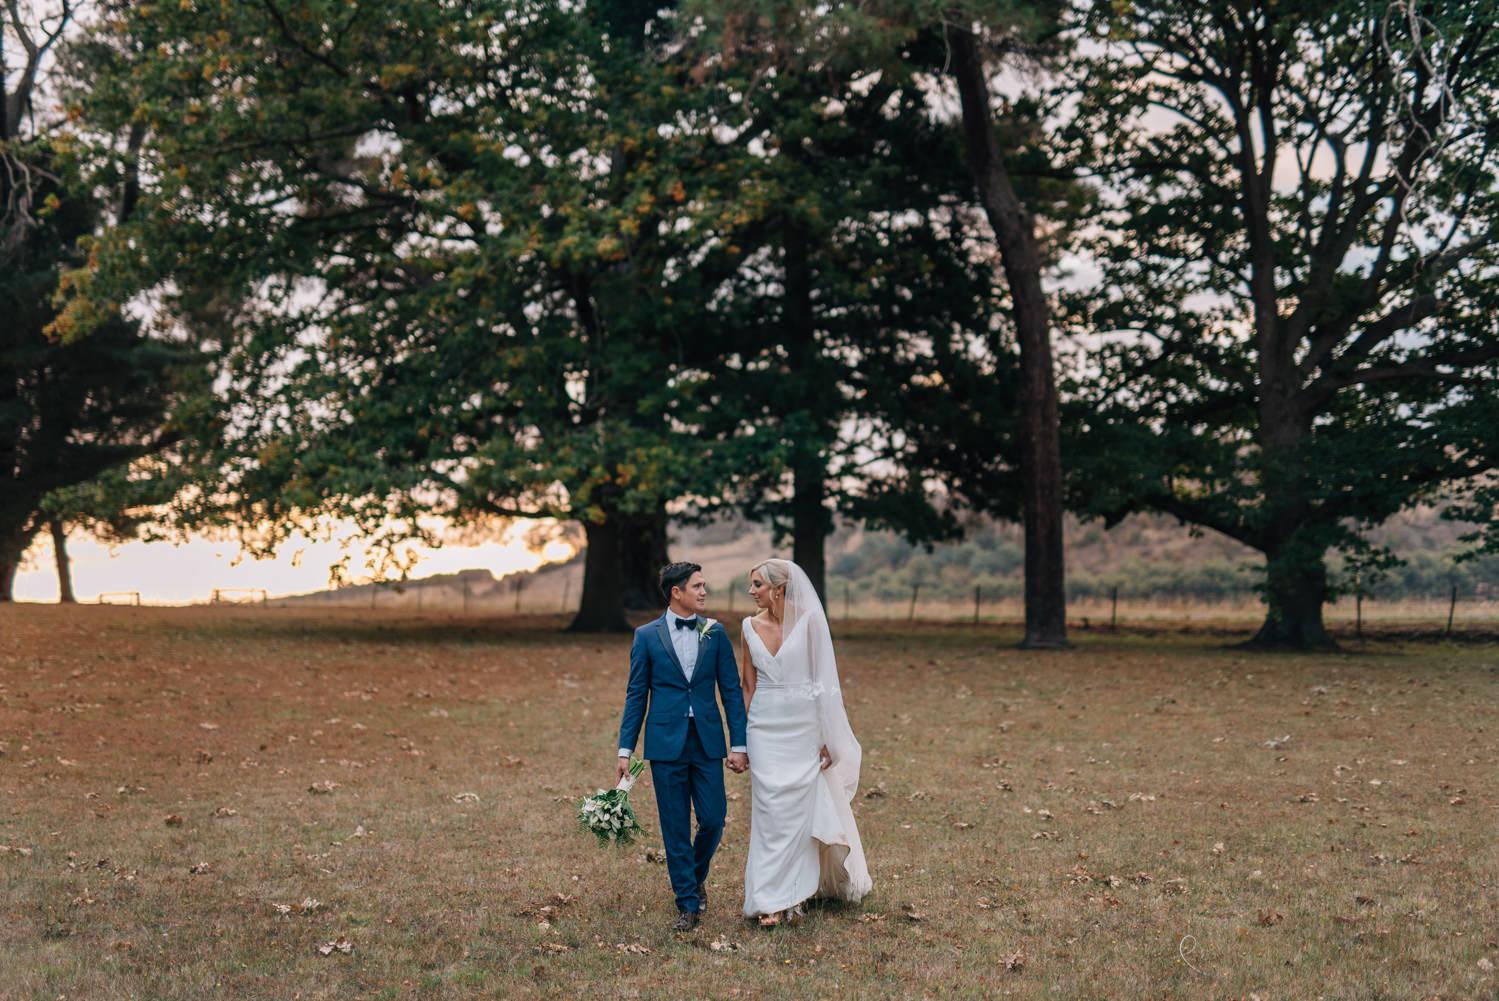 Entally-House-Wedding-Photographer-82.jpg